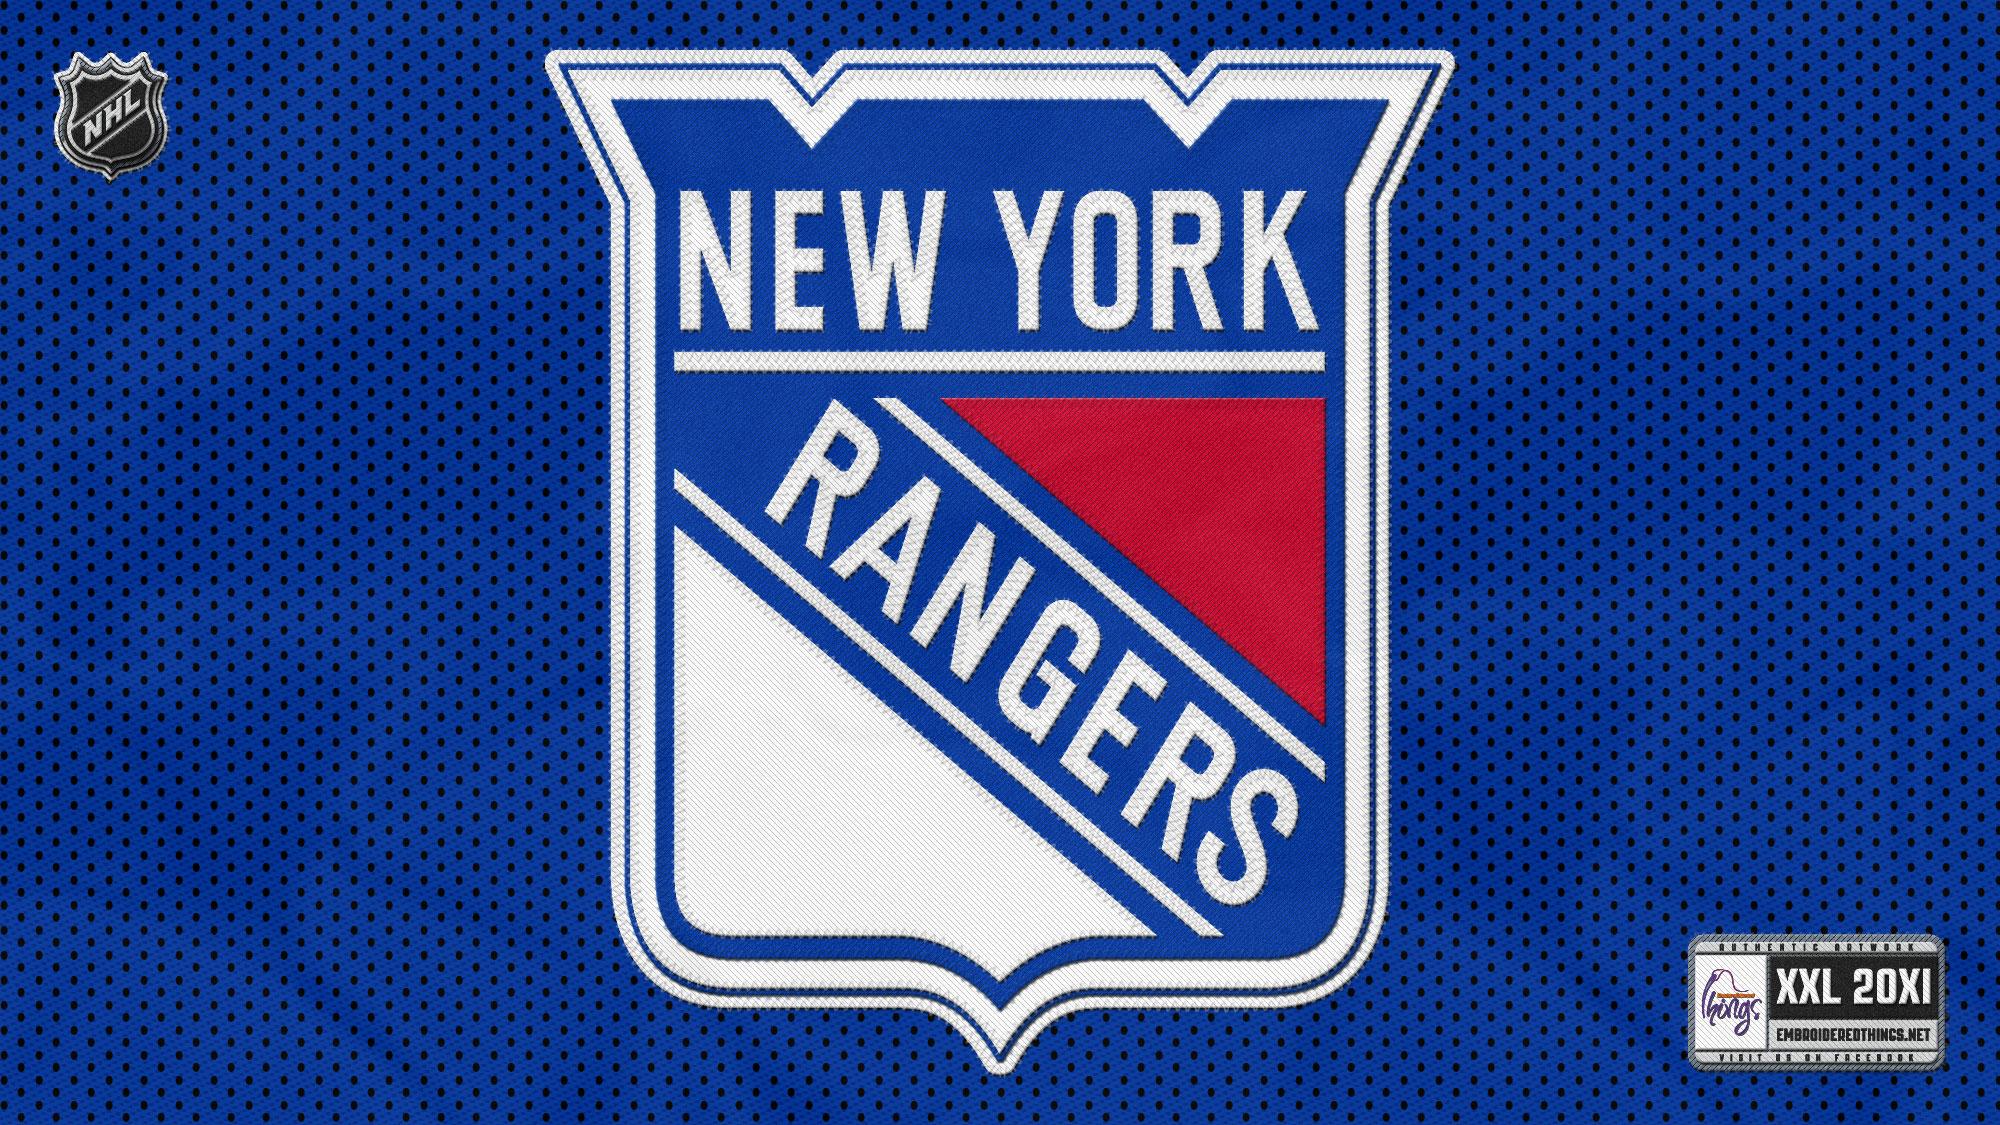 New York Rangers desktop wallpaper New York Rangers wallpapers 2000x1125